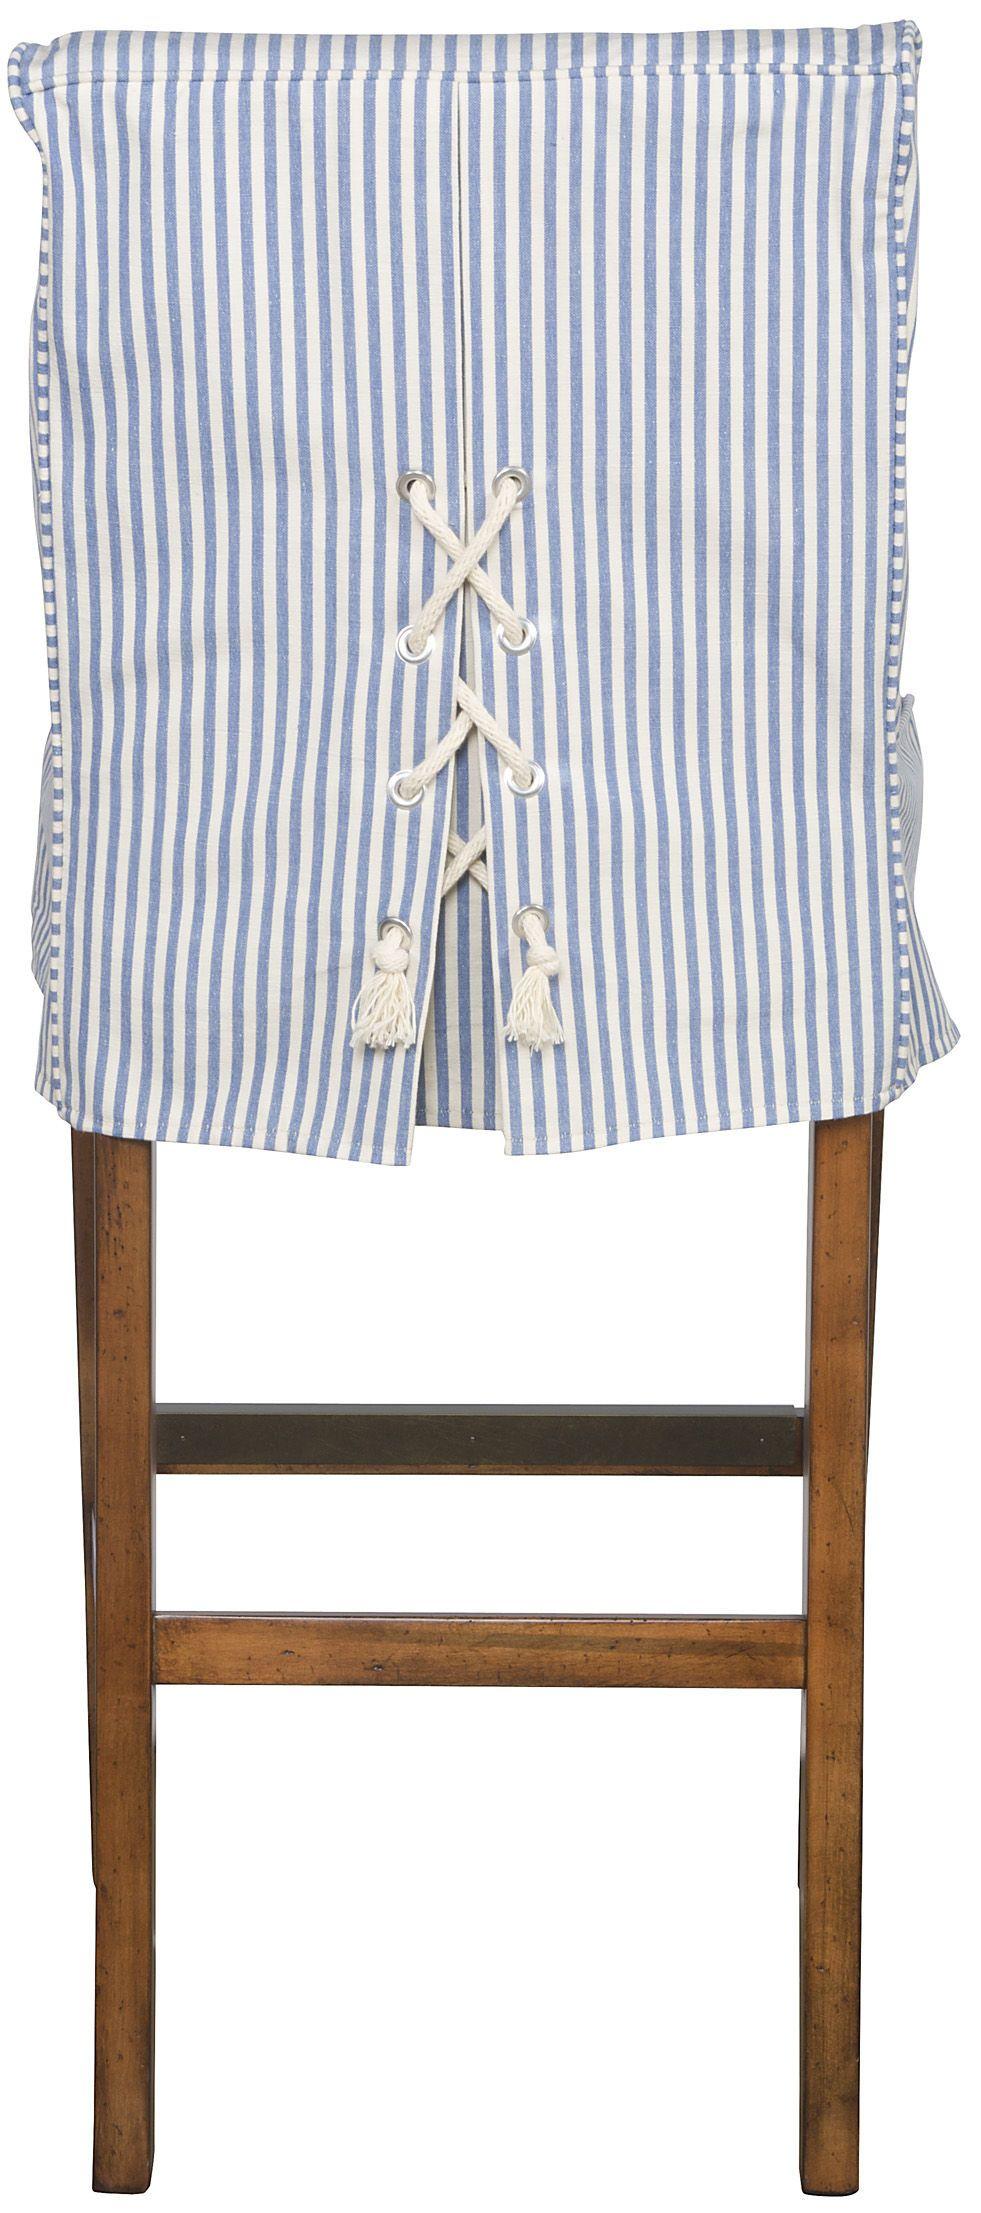 Slipcover Bar Stool Slipcovers For Chairs Bar Stool